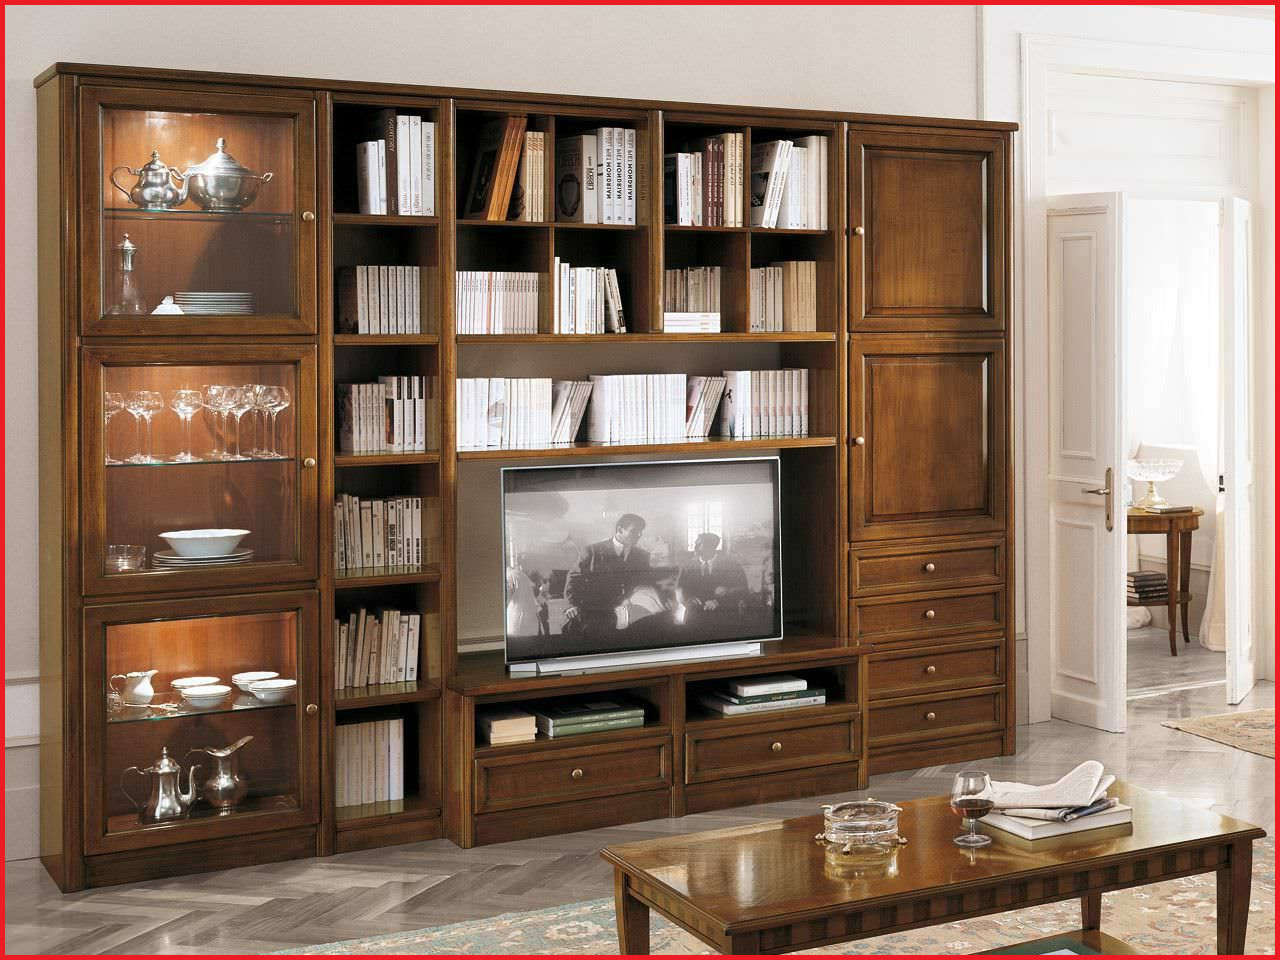 Muebles online espana best hermoso de muebles de oficina for Muebles de oficina madrid baratos